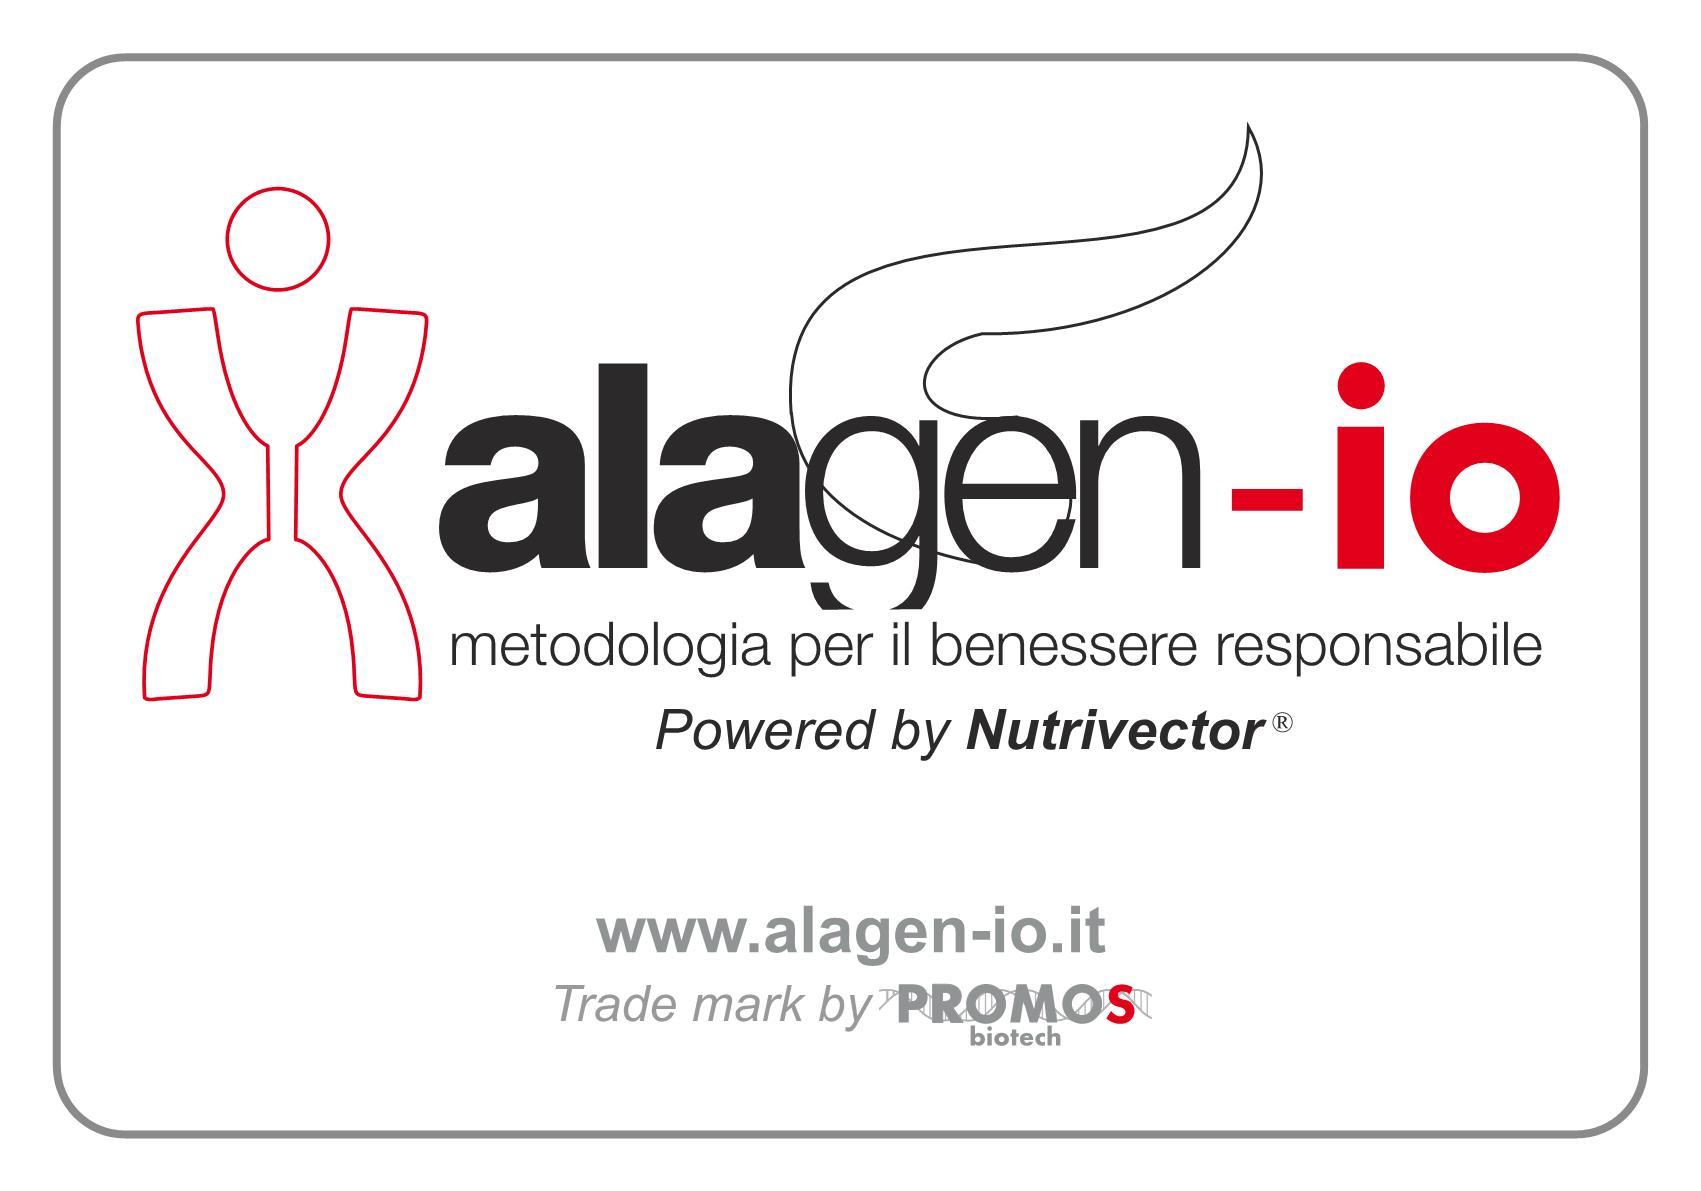 Alagen Io